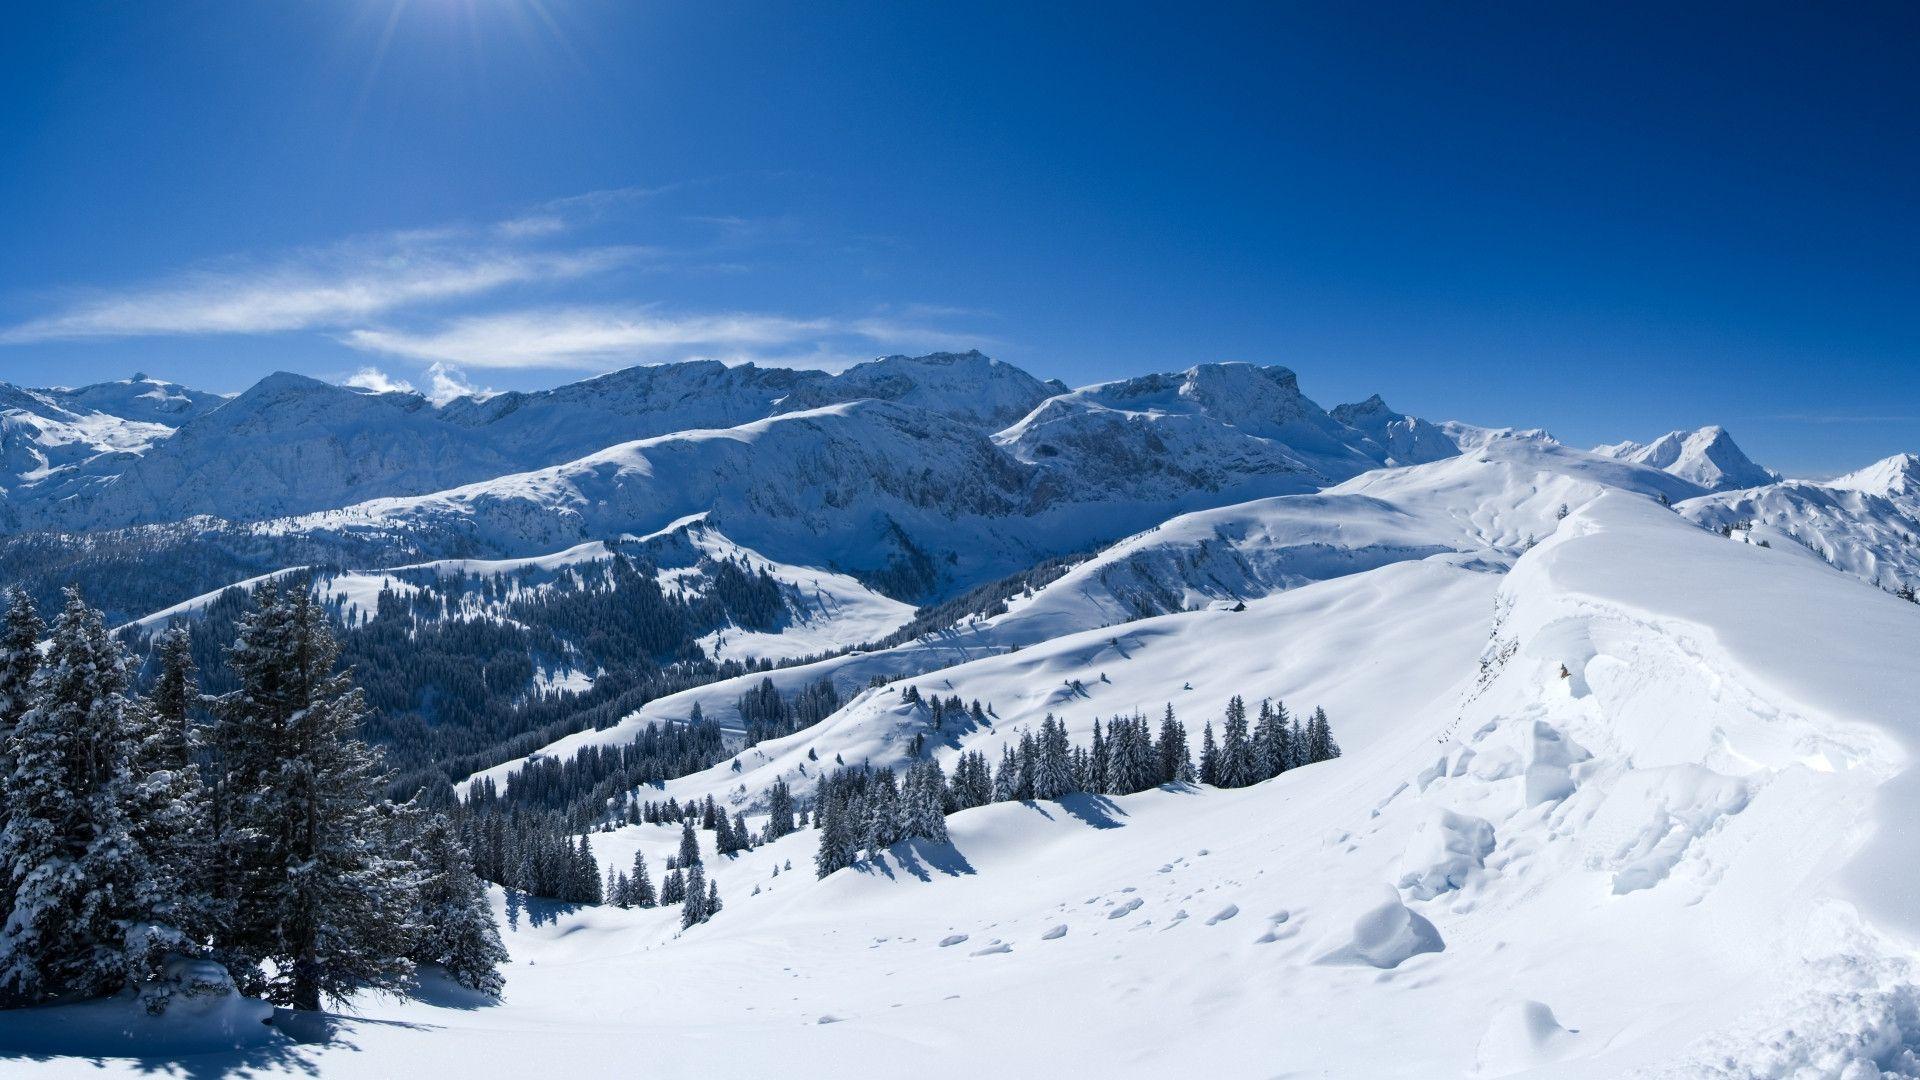 mountain hd wallpapers 1080p